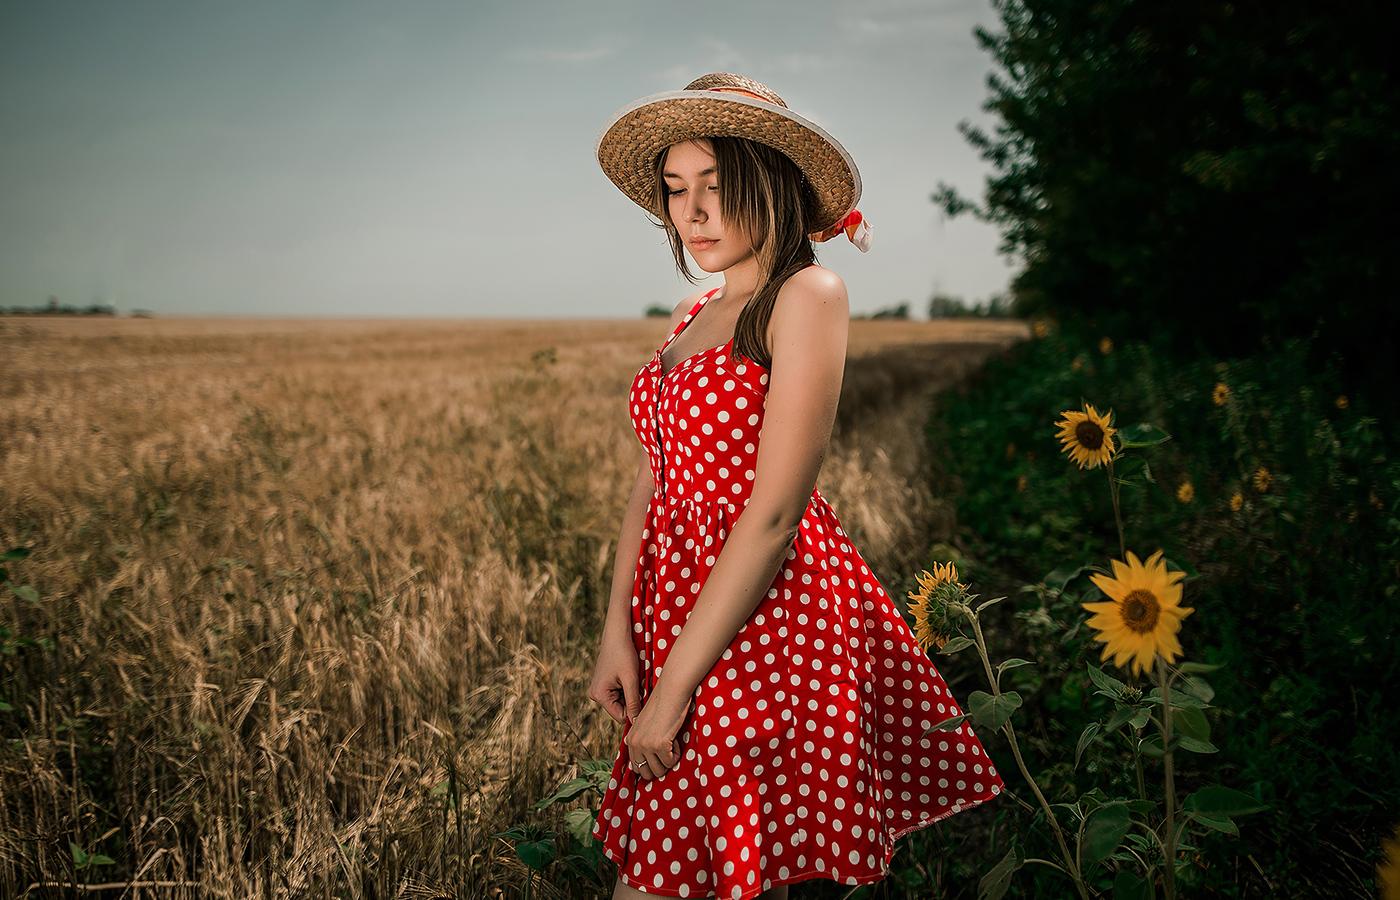 girl-field-hat-ks.jpg